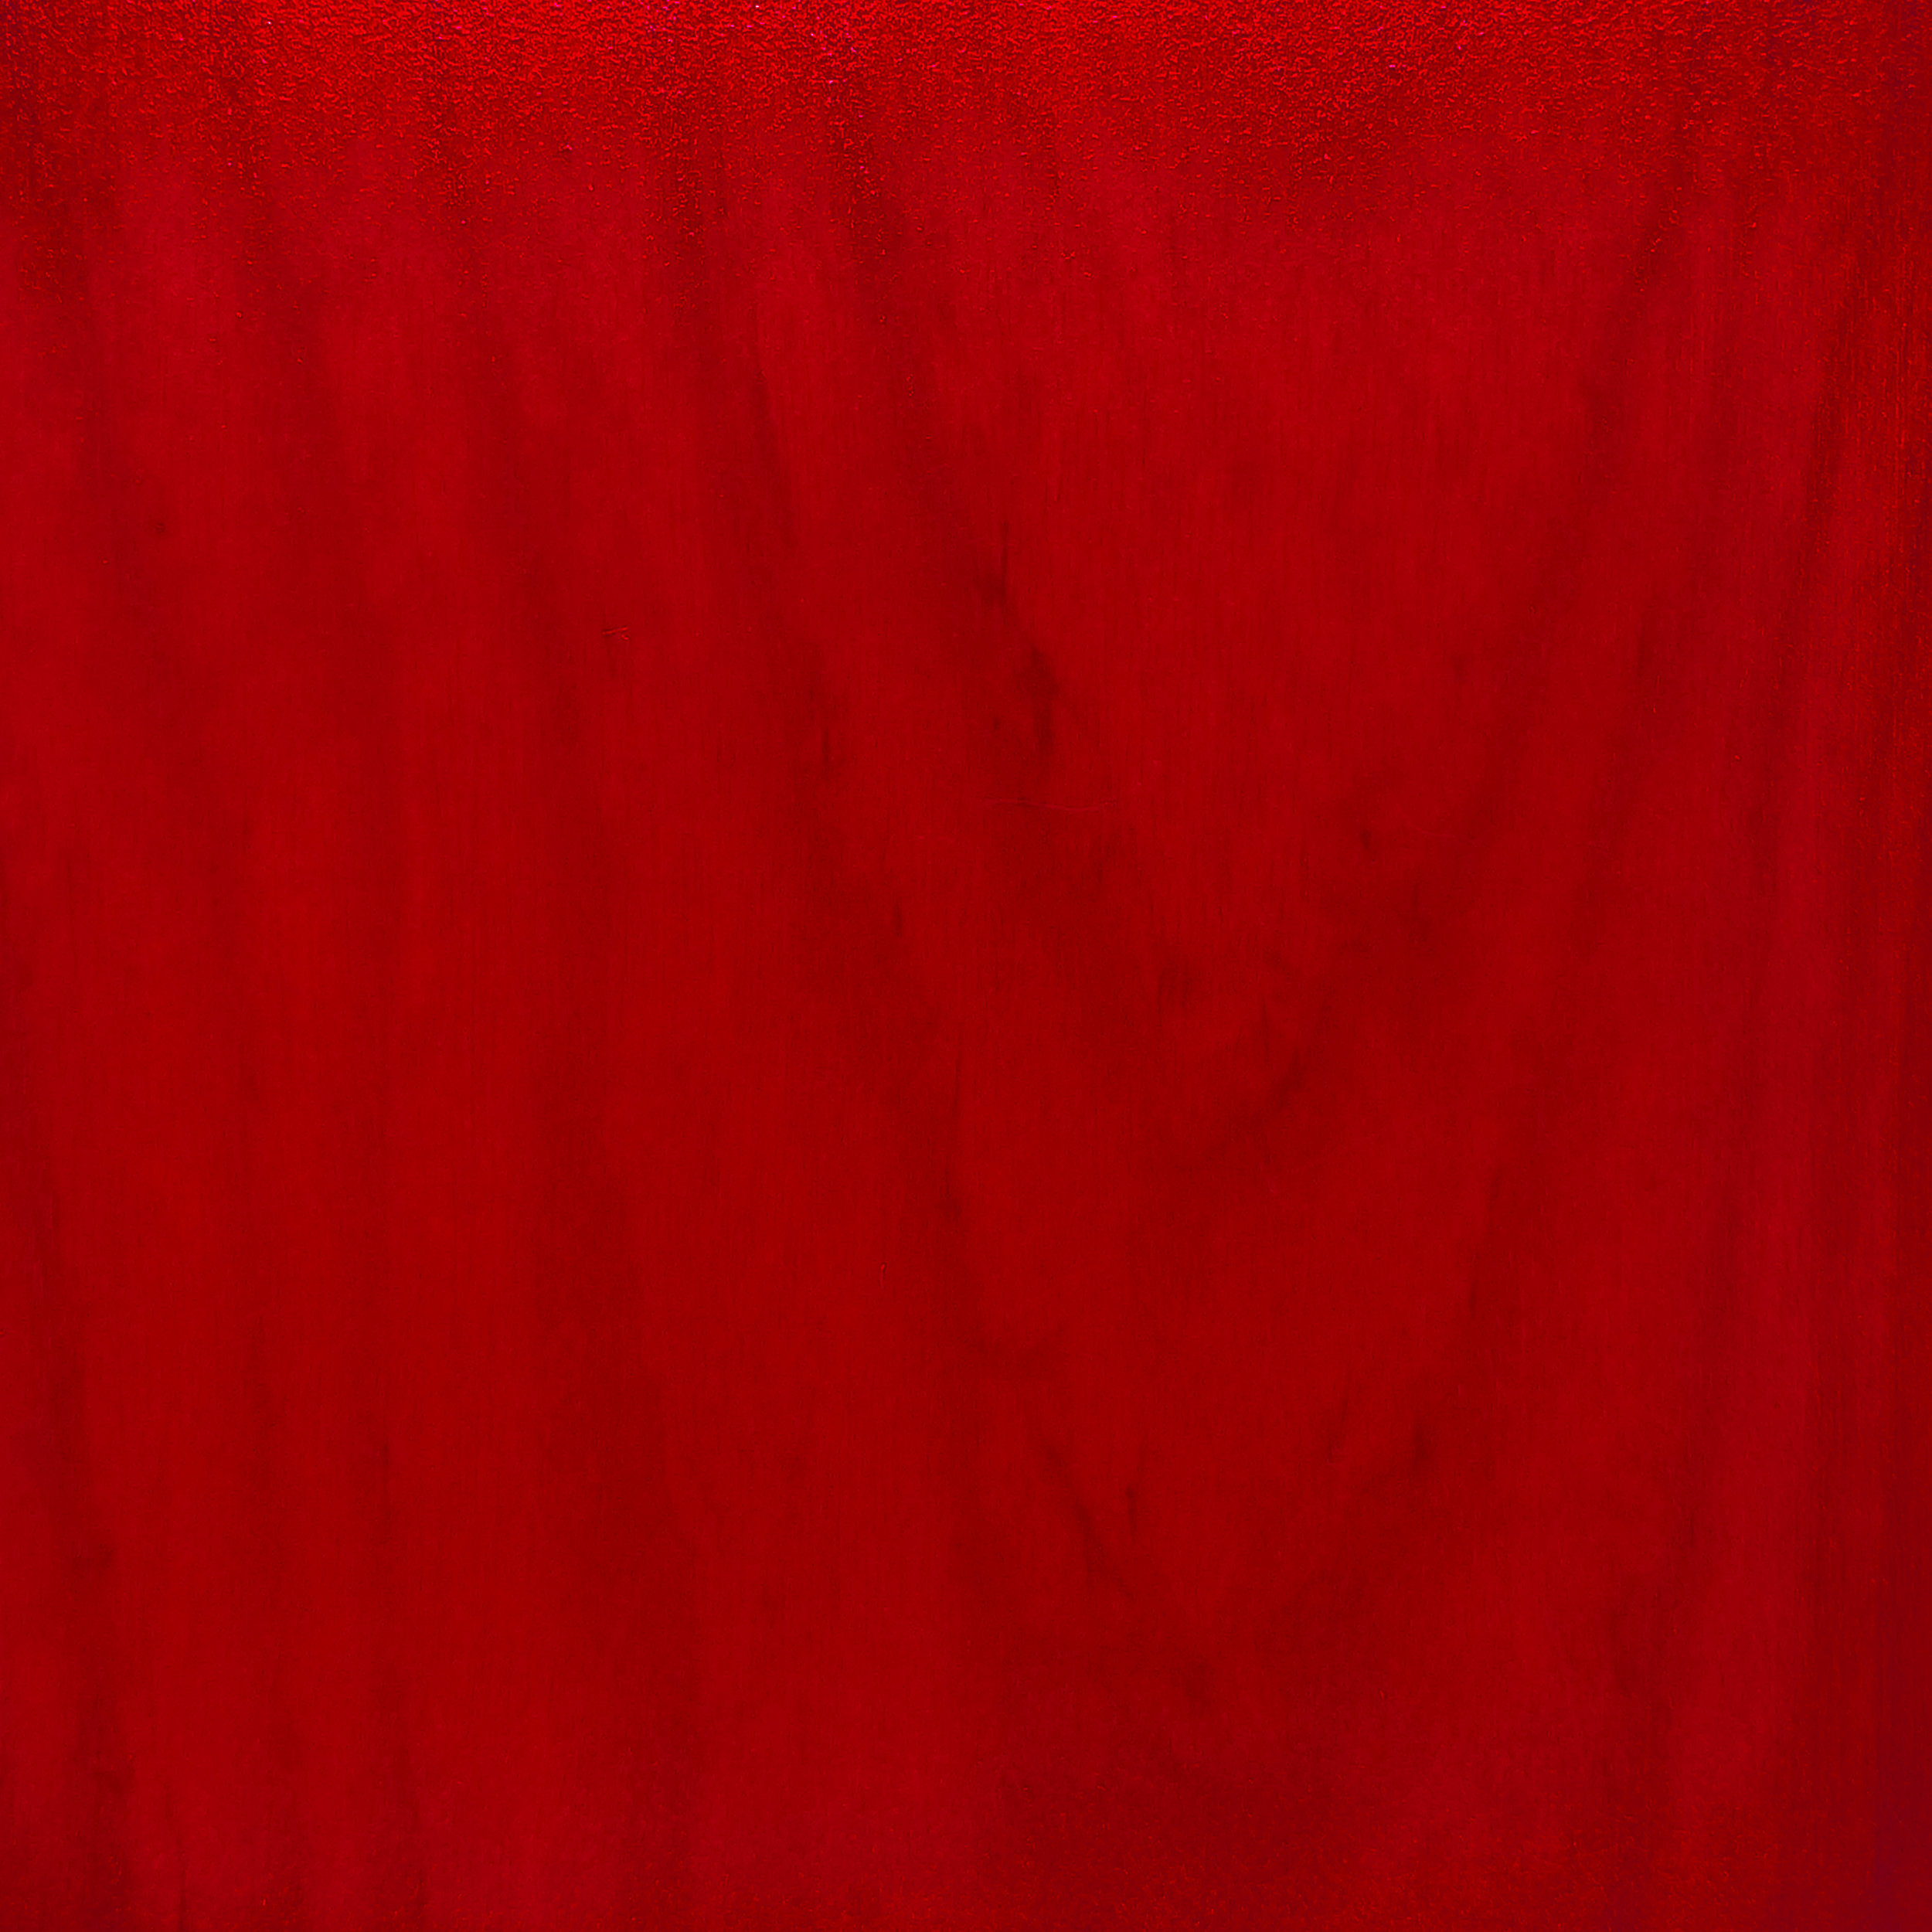 Red, Light